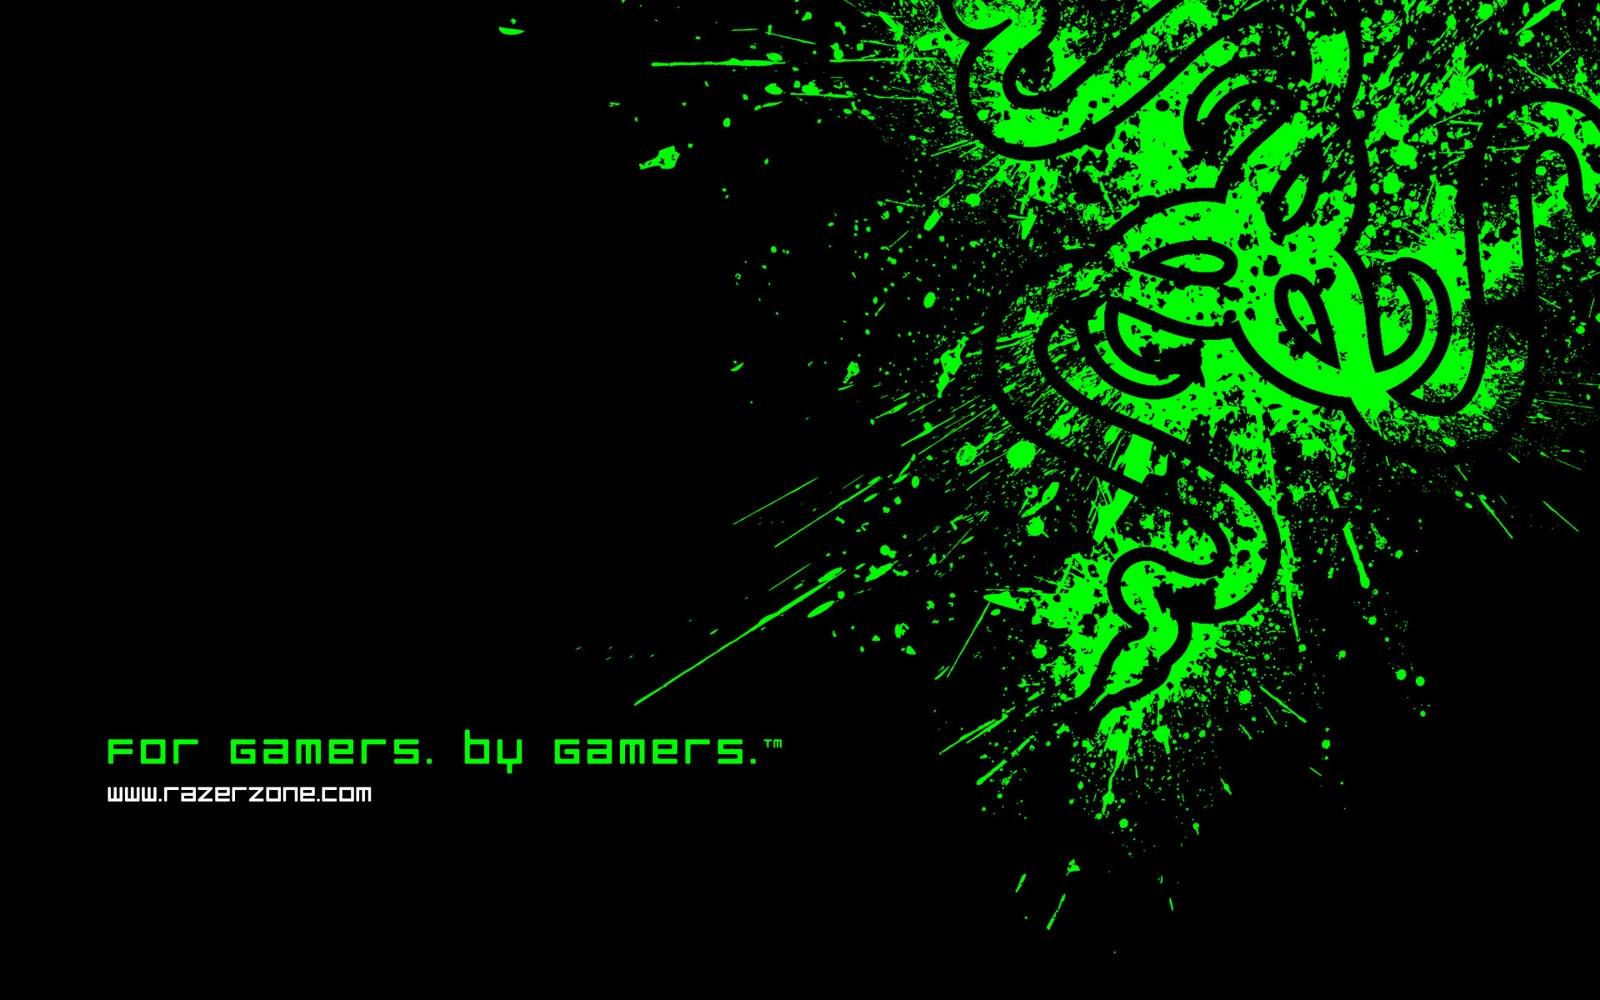 http://3.bp.blogspot.com/-gXNS-fcAXU4/Tg31uj0d_QI/AAAAAAAABDs/p9r8HFkipnY/s1600/Razer_green_logo_hd_wallpaper_1920x1200.jpg